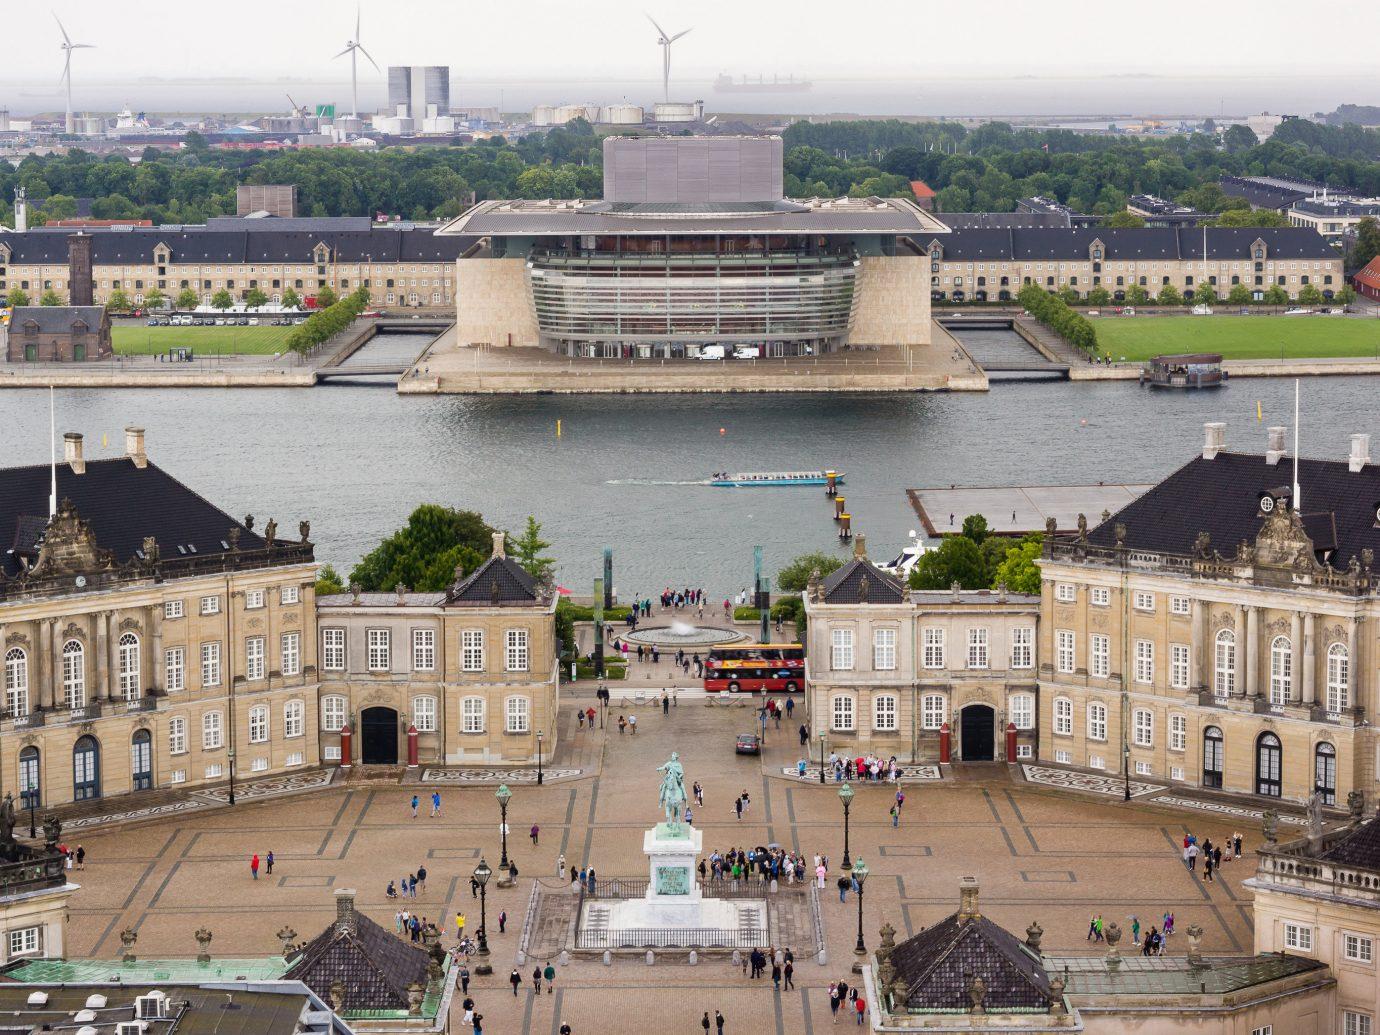 Copenhagen Denmark Trip Ideas City urban area plaza water building sky town square roof skyline